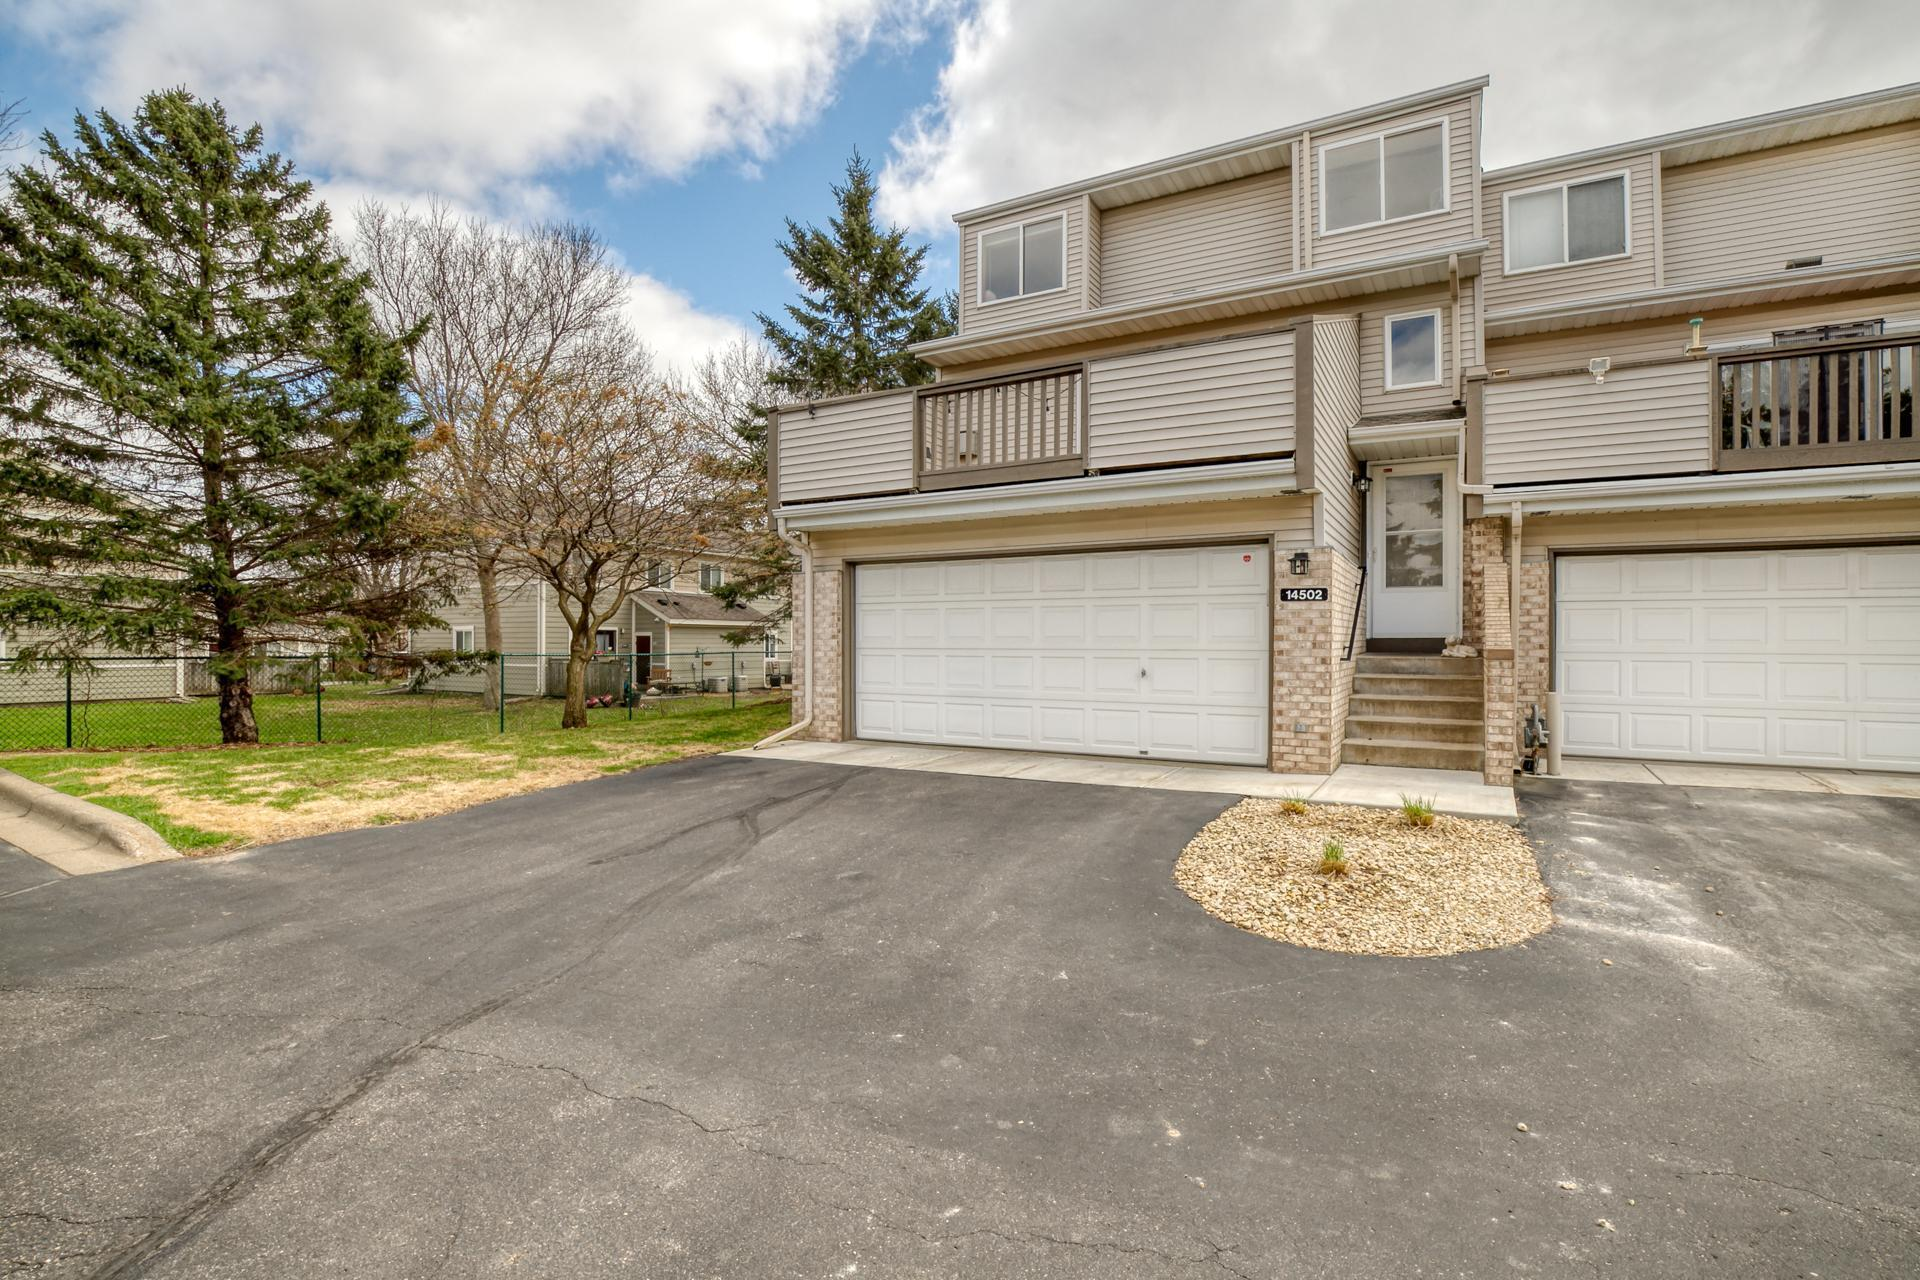 14502 Cobalt Avenue, Rosemount MN 55068 - Photo 1